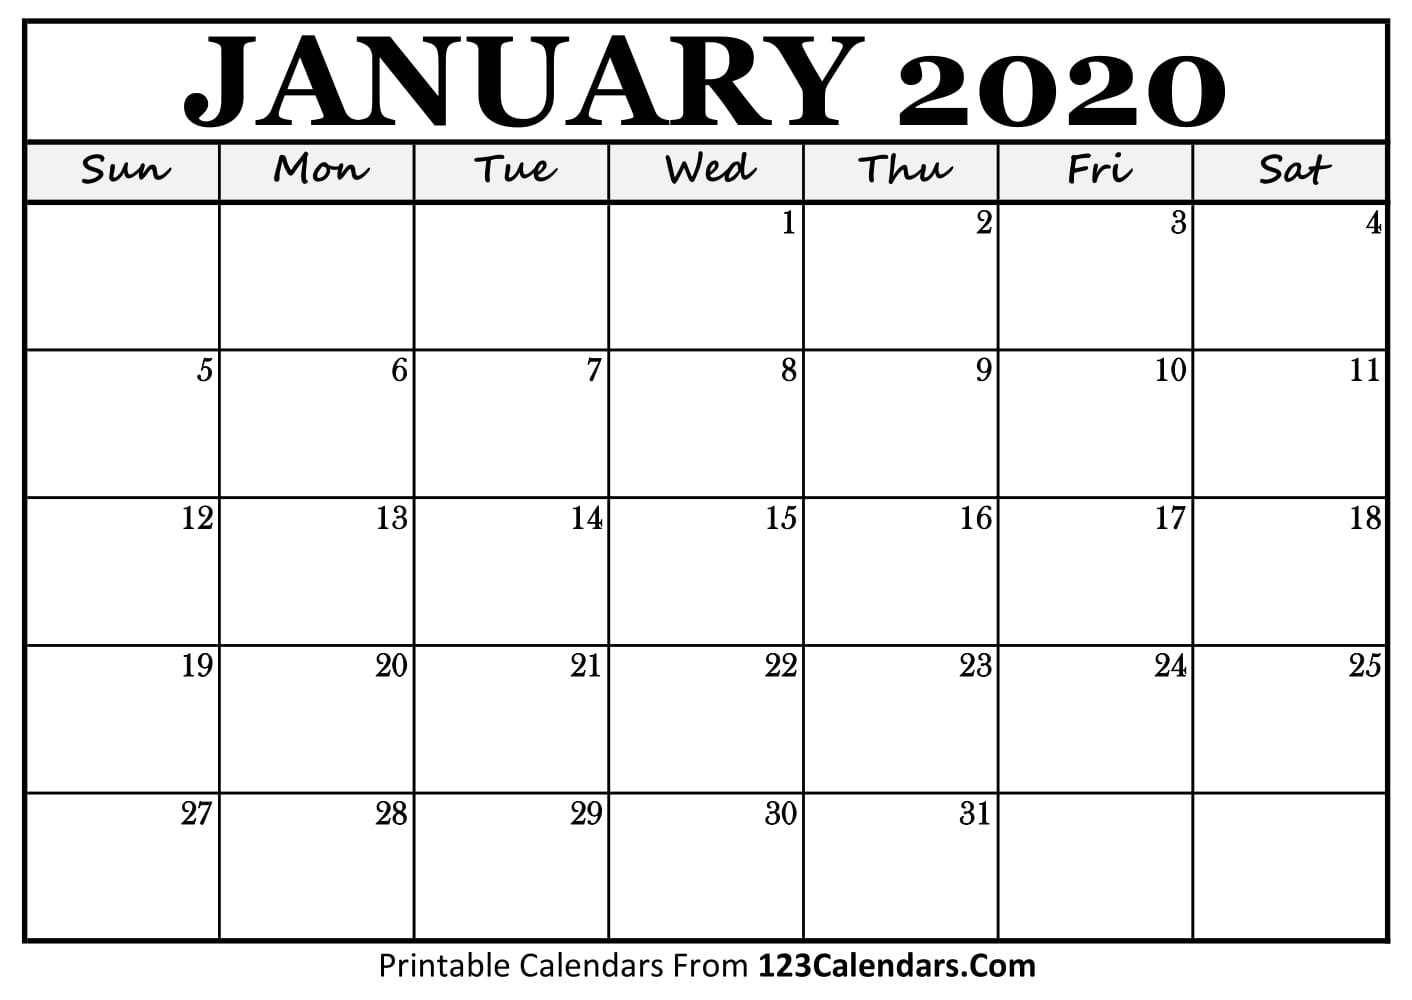 January 2020 Printable Calendar | 123Calendars Calendar Of 2019 January